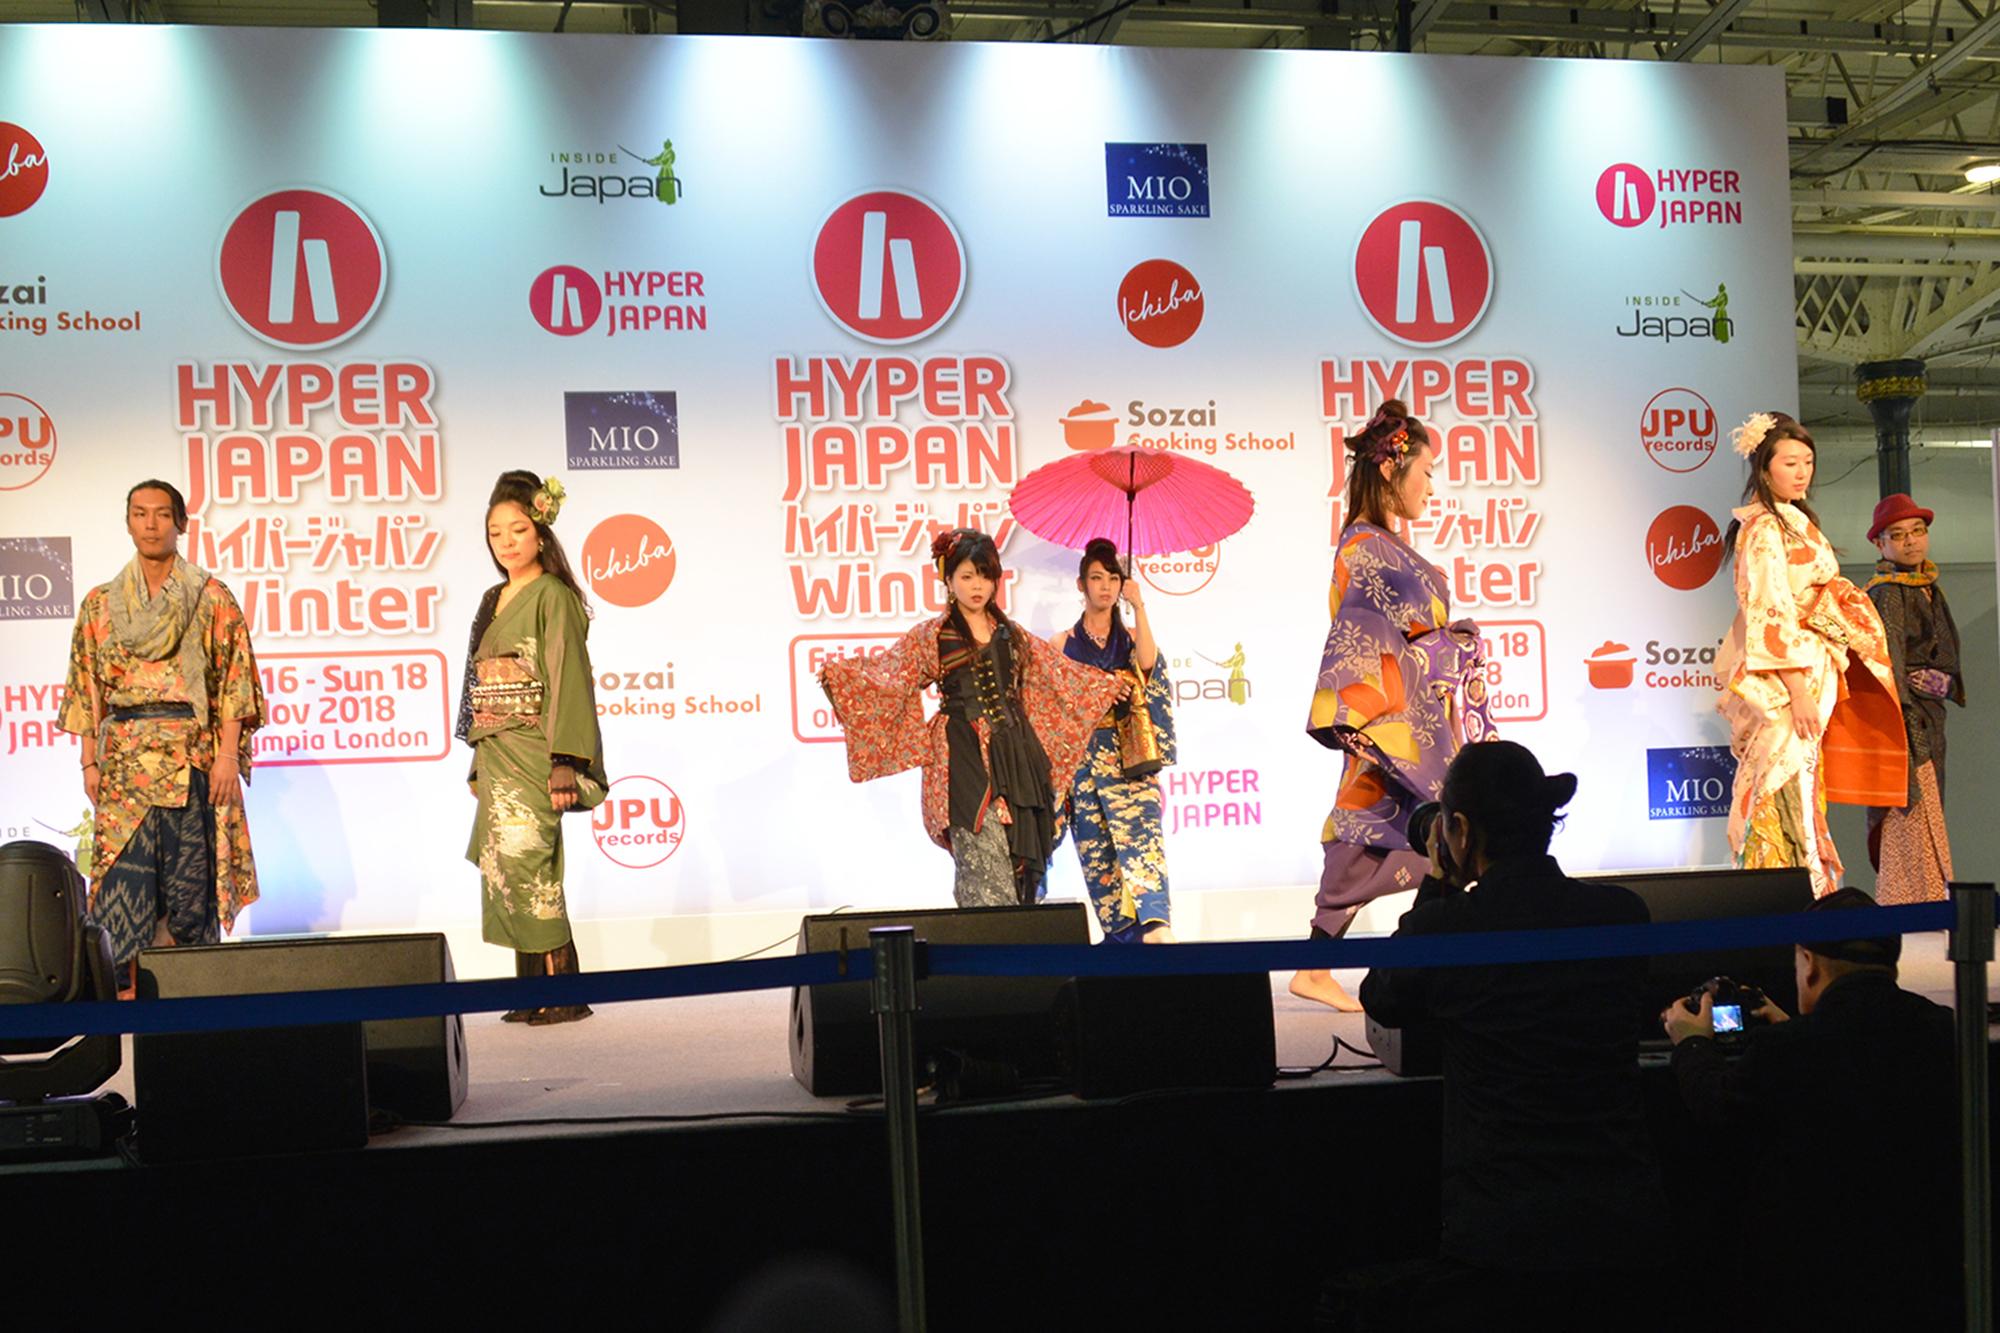 20181214 [HYPER JAPAN] 『HYPER JAPAN 2018 WINTER』ReFashion Caravan ブース&ステージパフォーマンスReport!